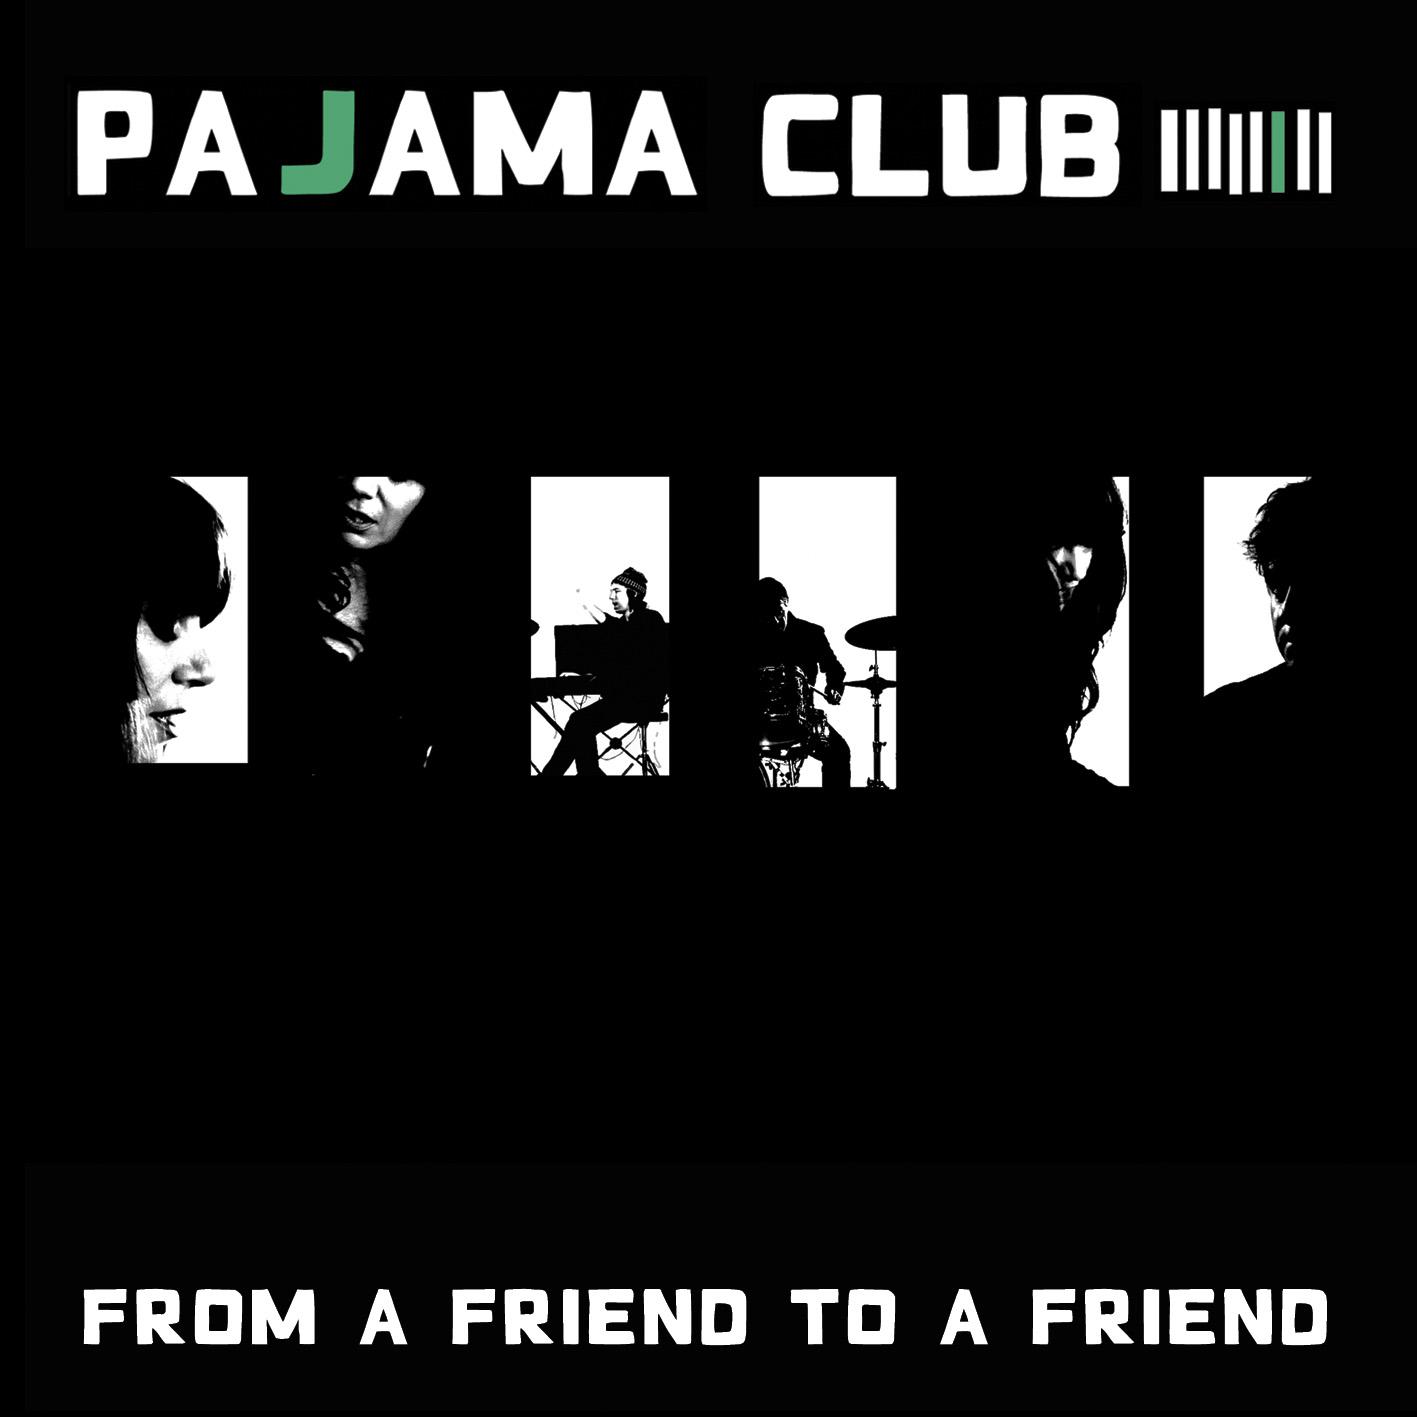 Pajama Club - From A Friend To A Friend - Single